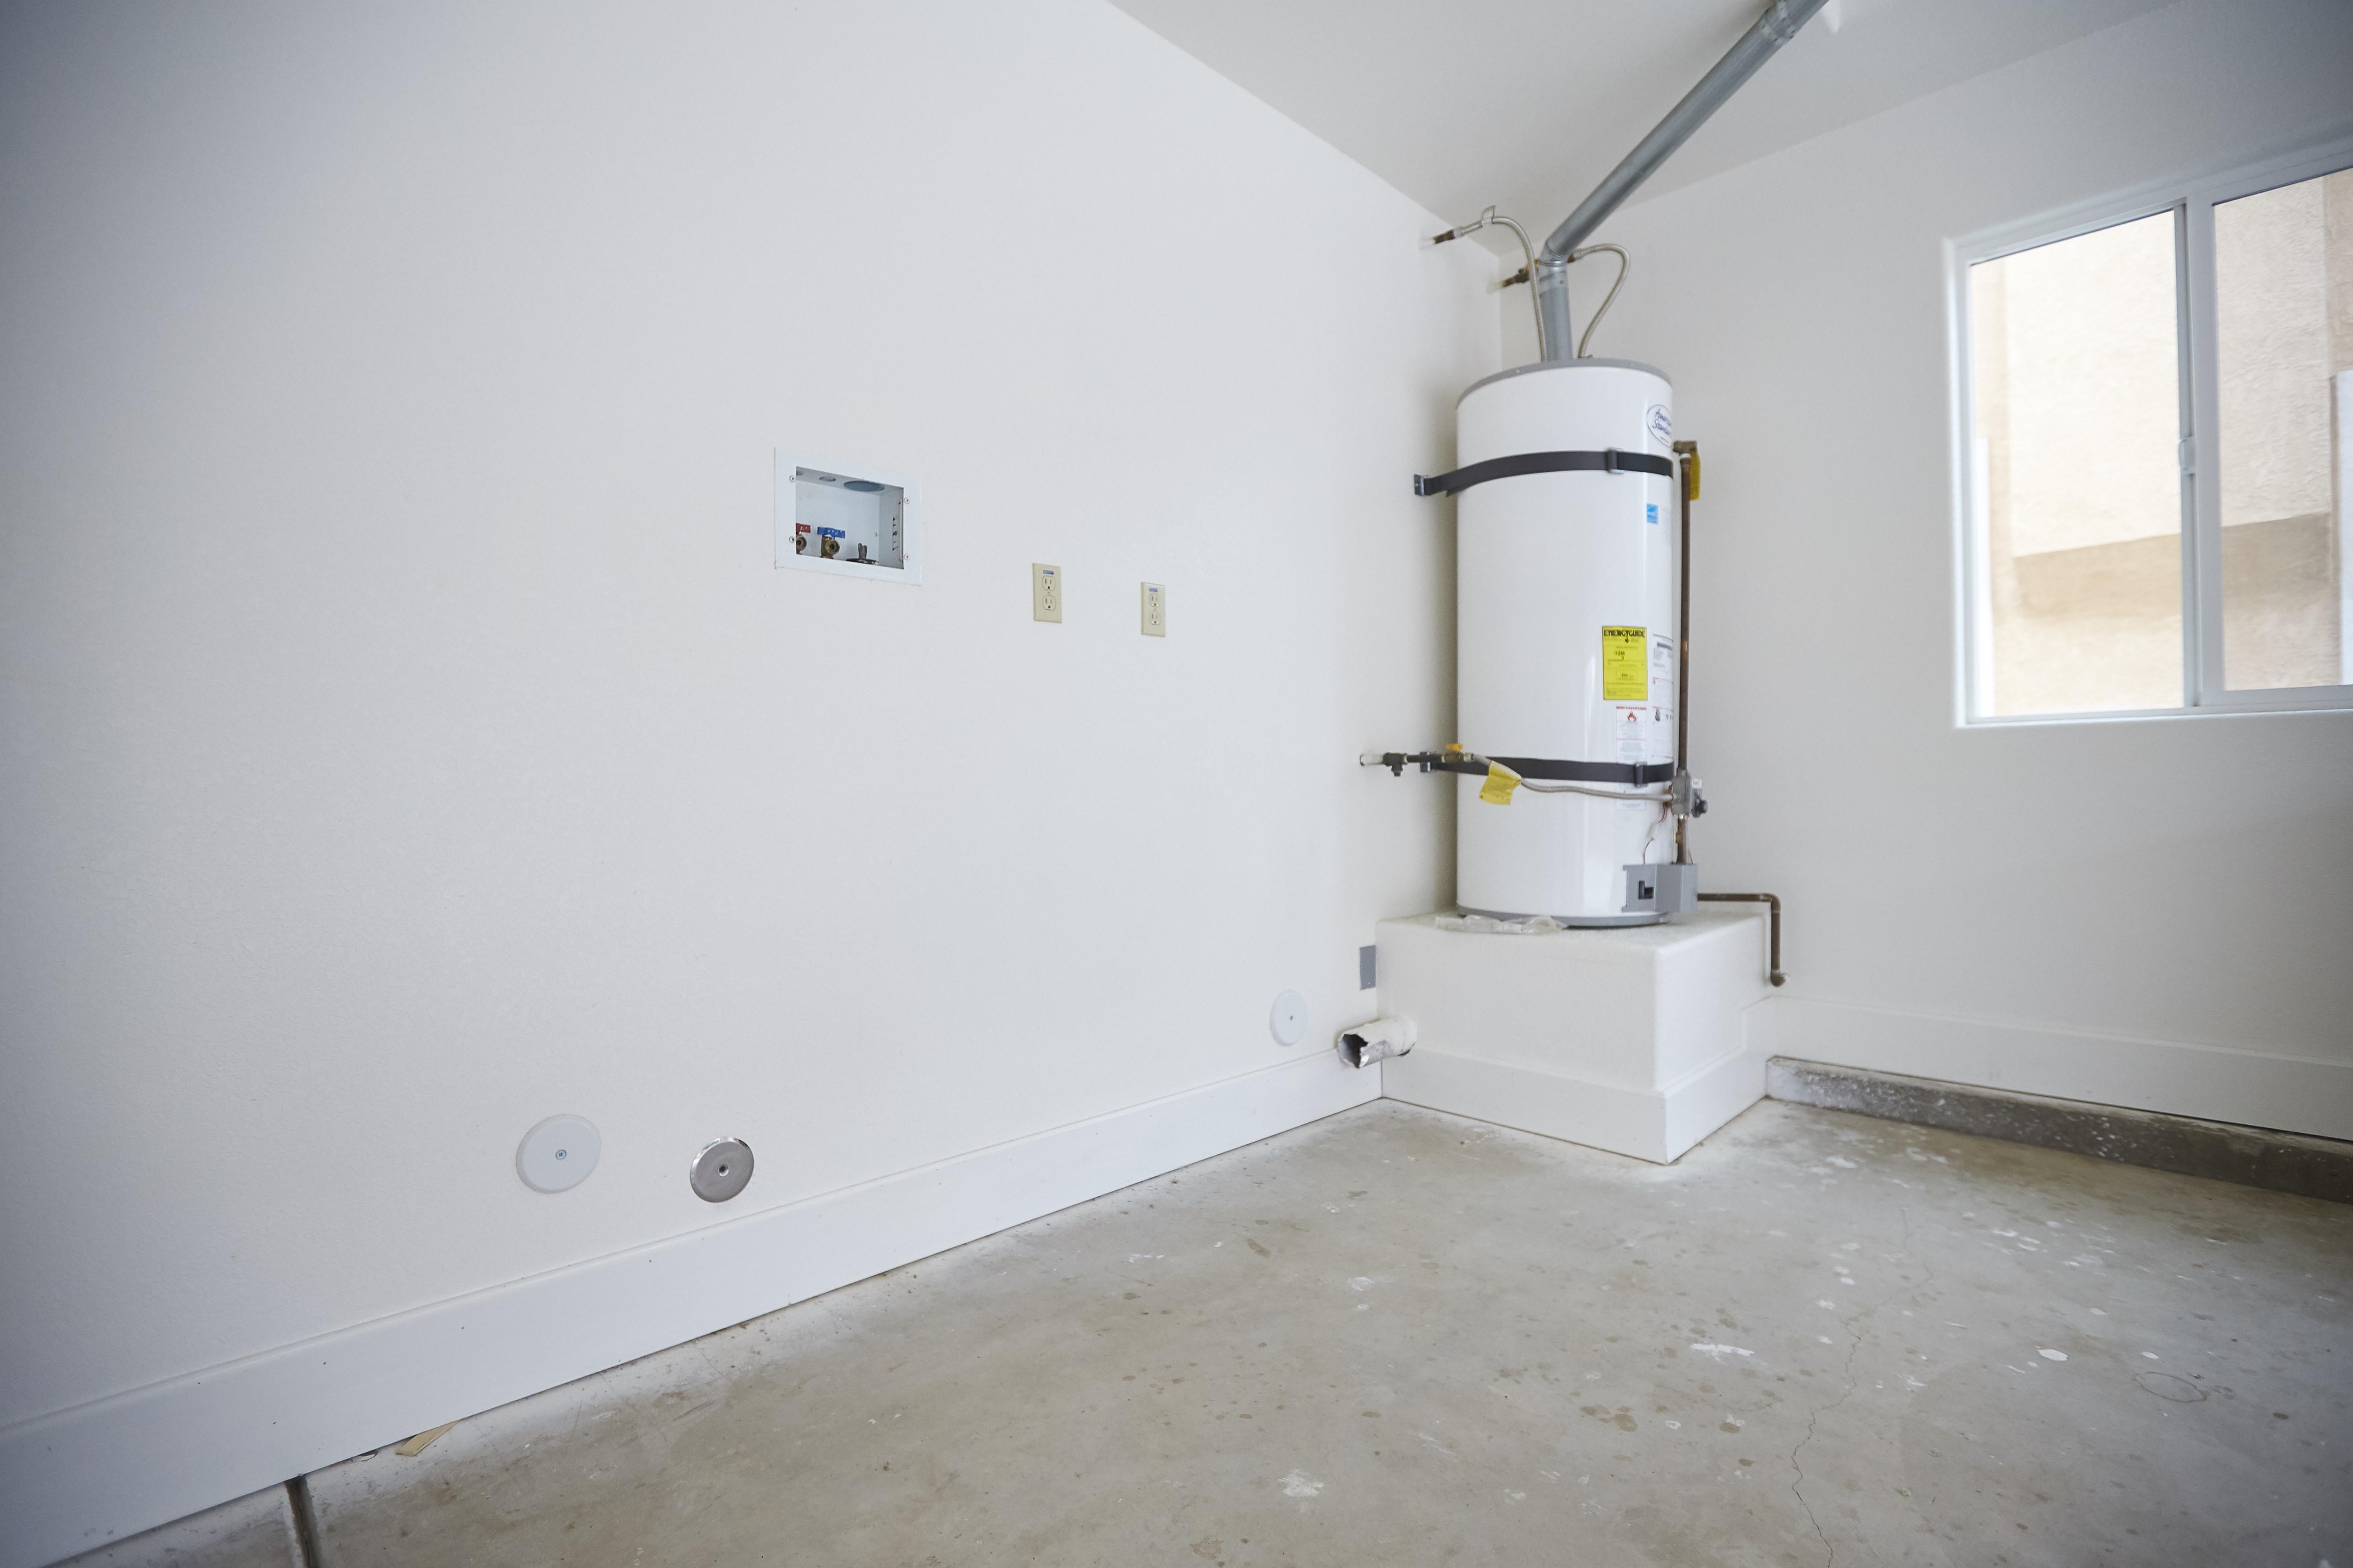 Water heater & Laundry